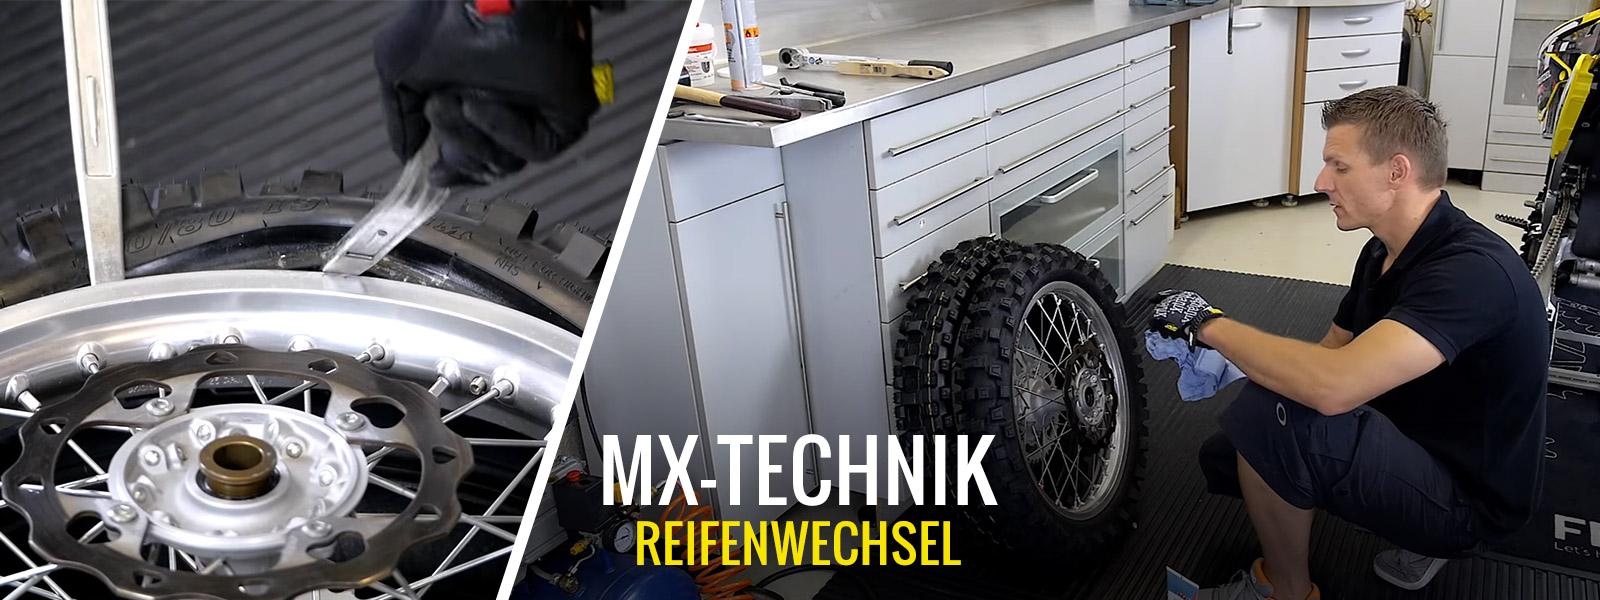 Motocros & Enduro - Reifenwechsel